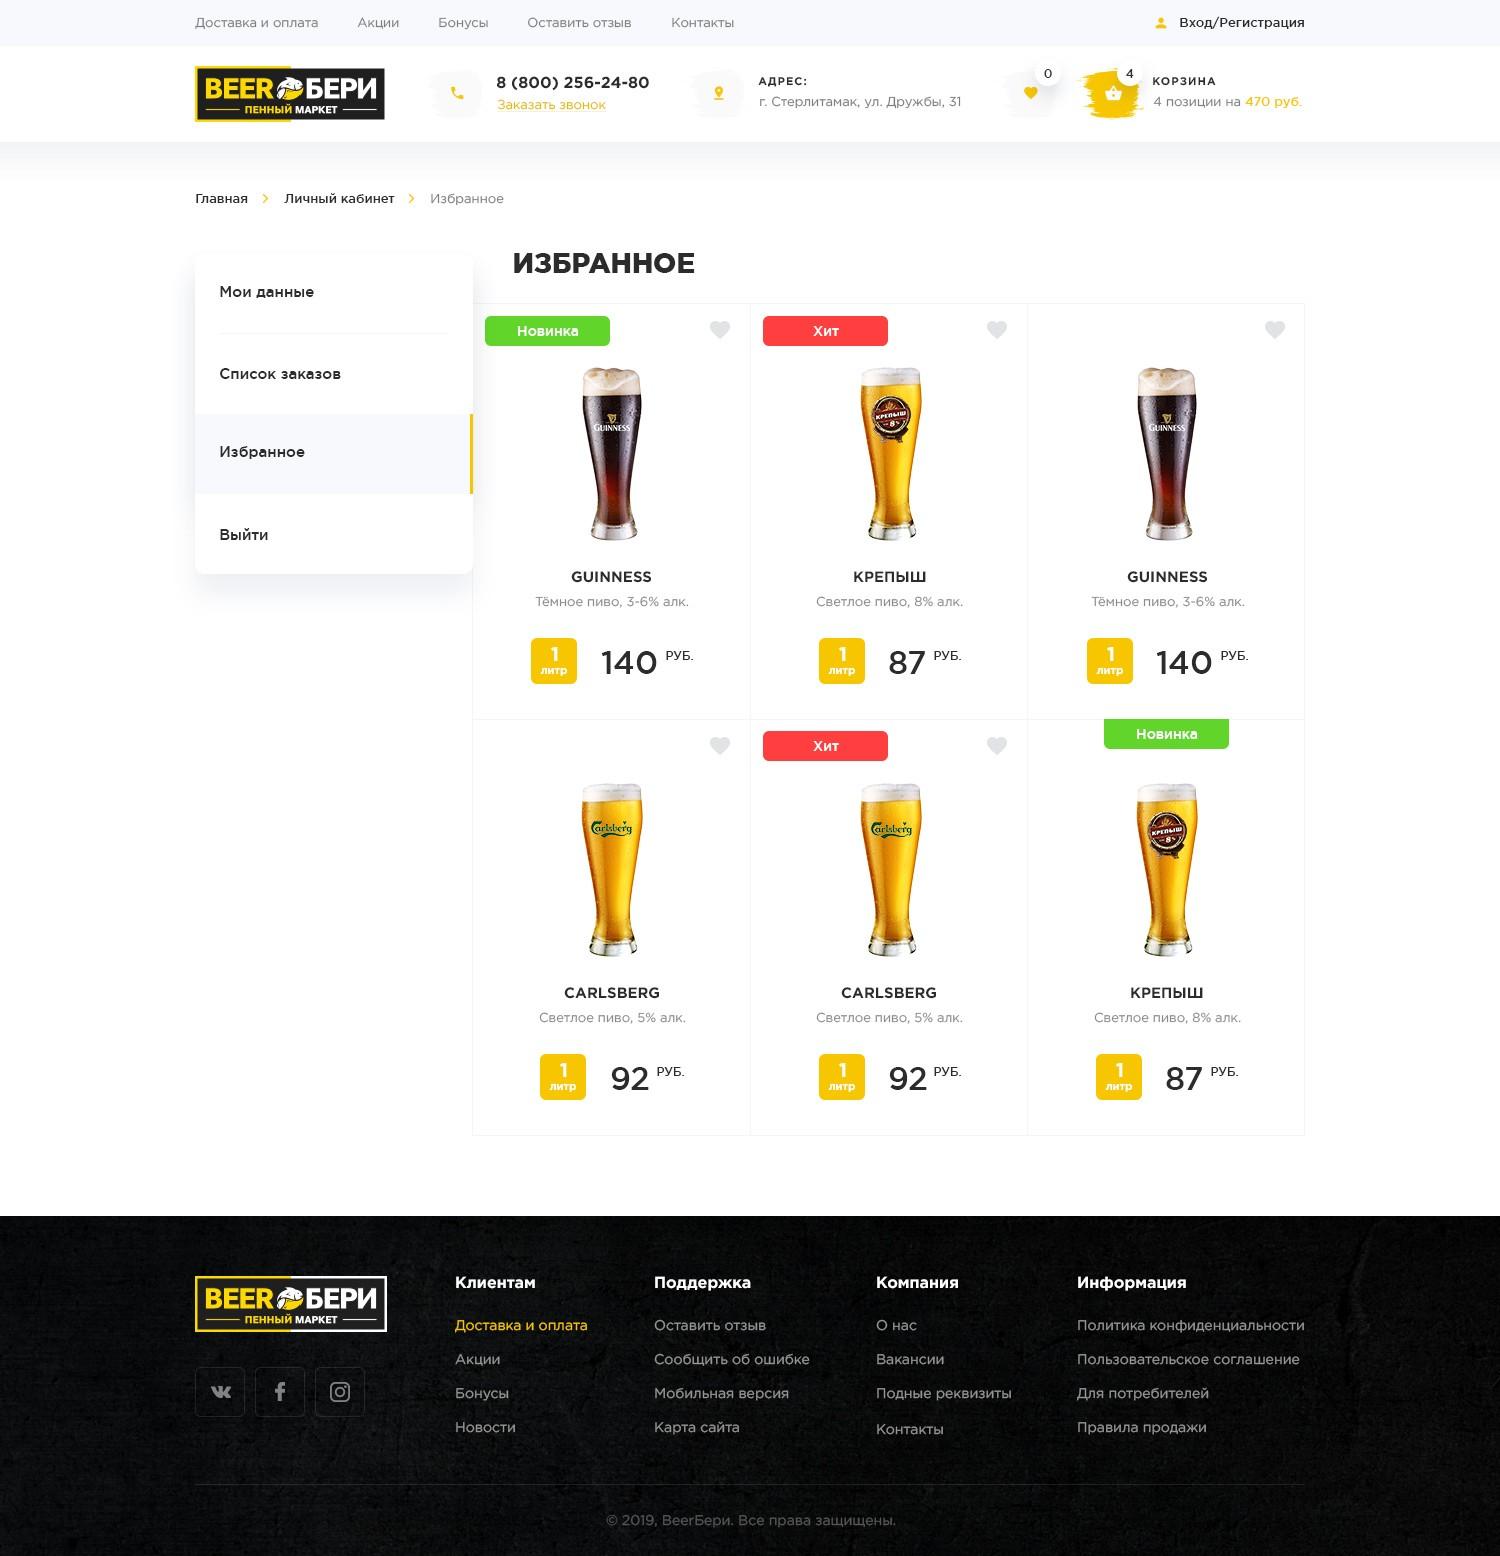 Beer_Take_it_12_Personal_area_(favorites)_1.0.png